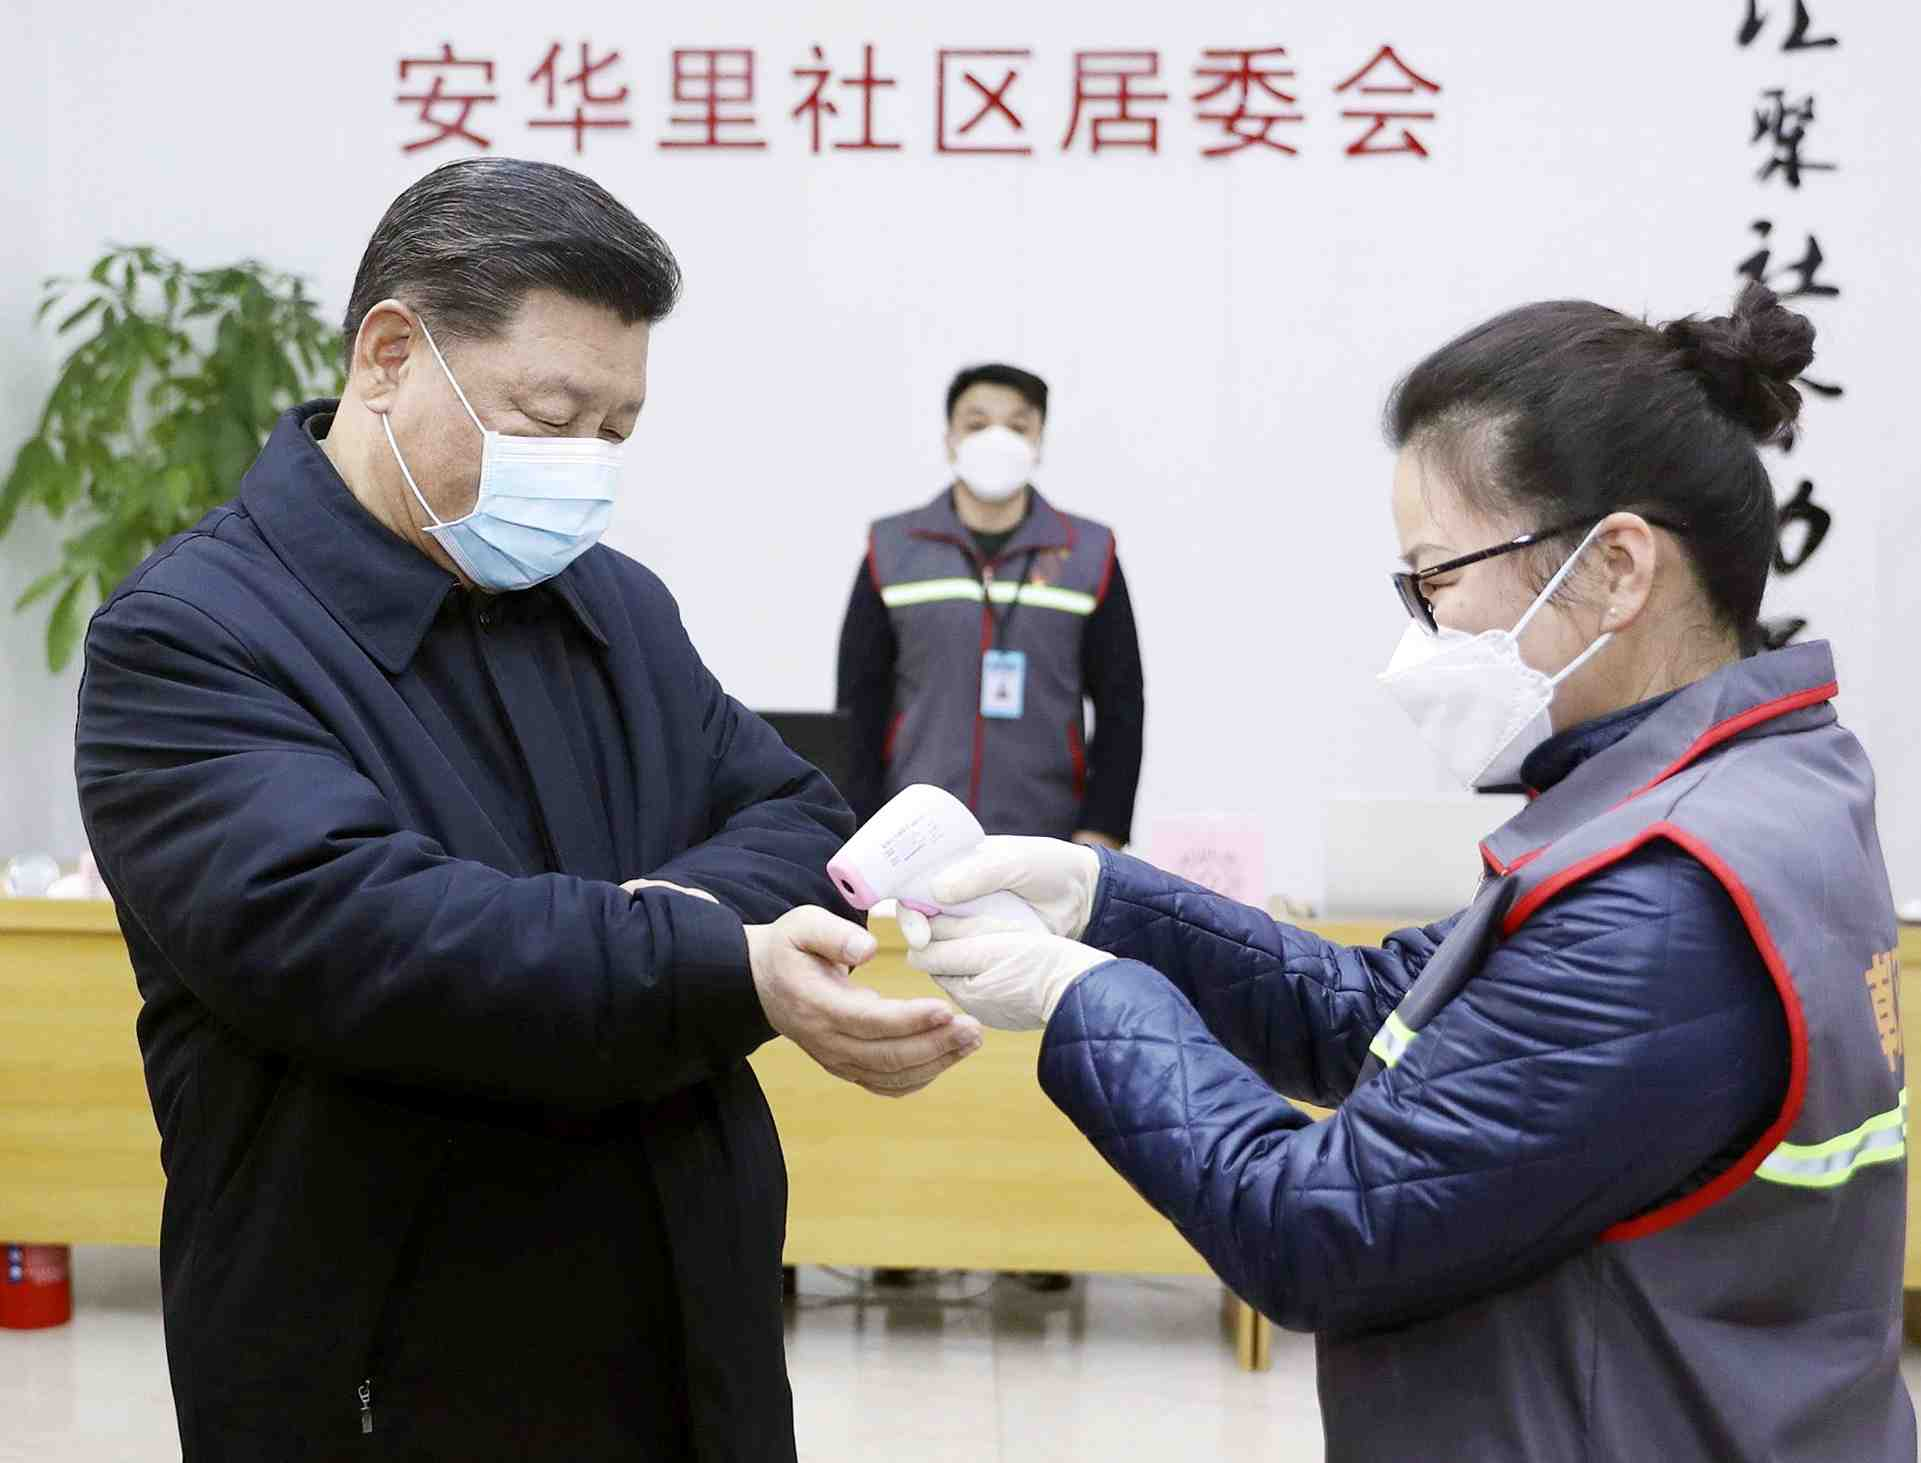 China Xi Jinping and Coronavirus 007